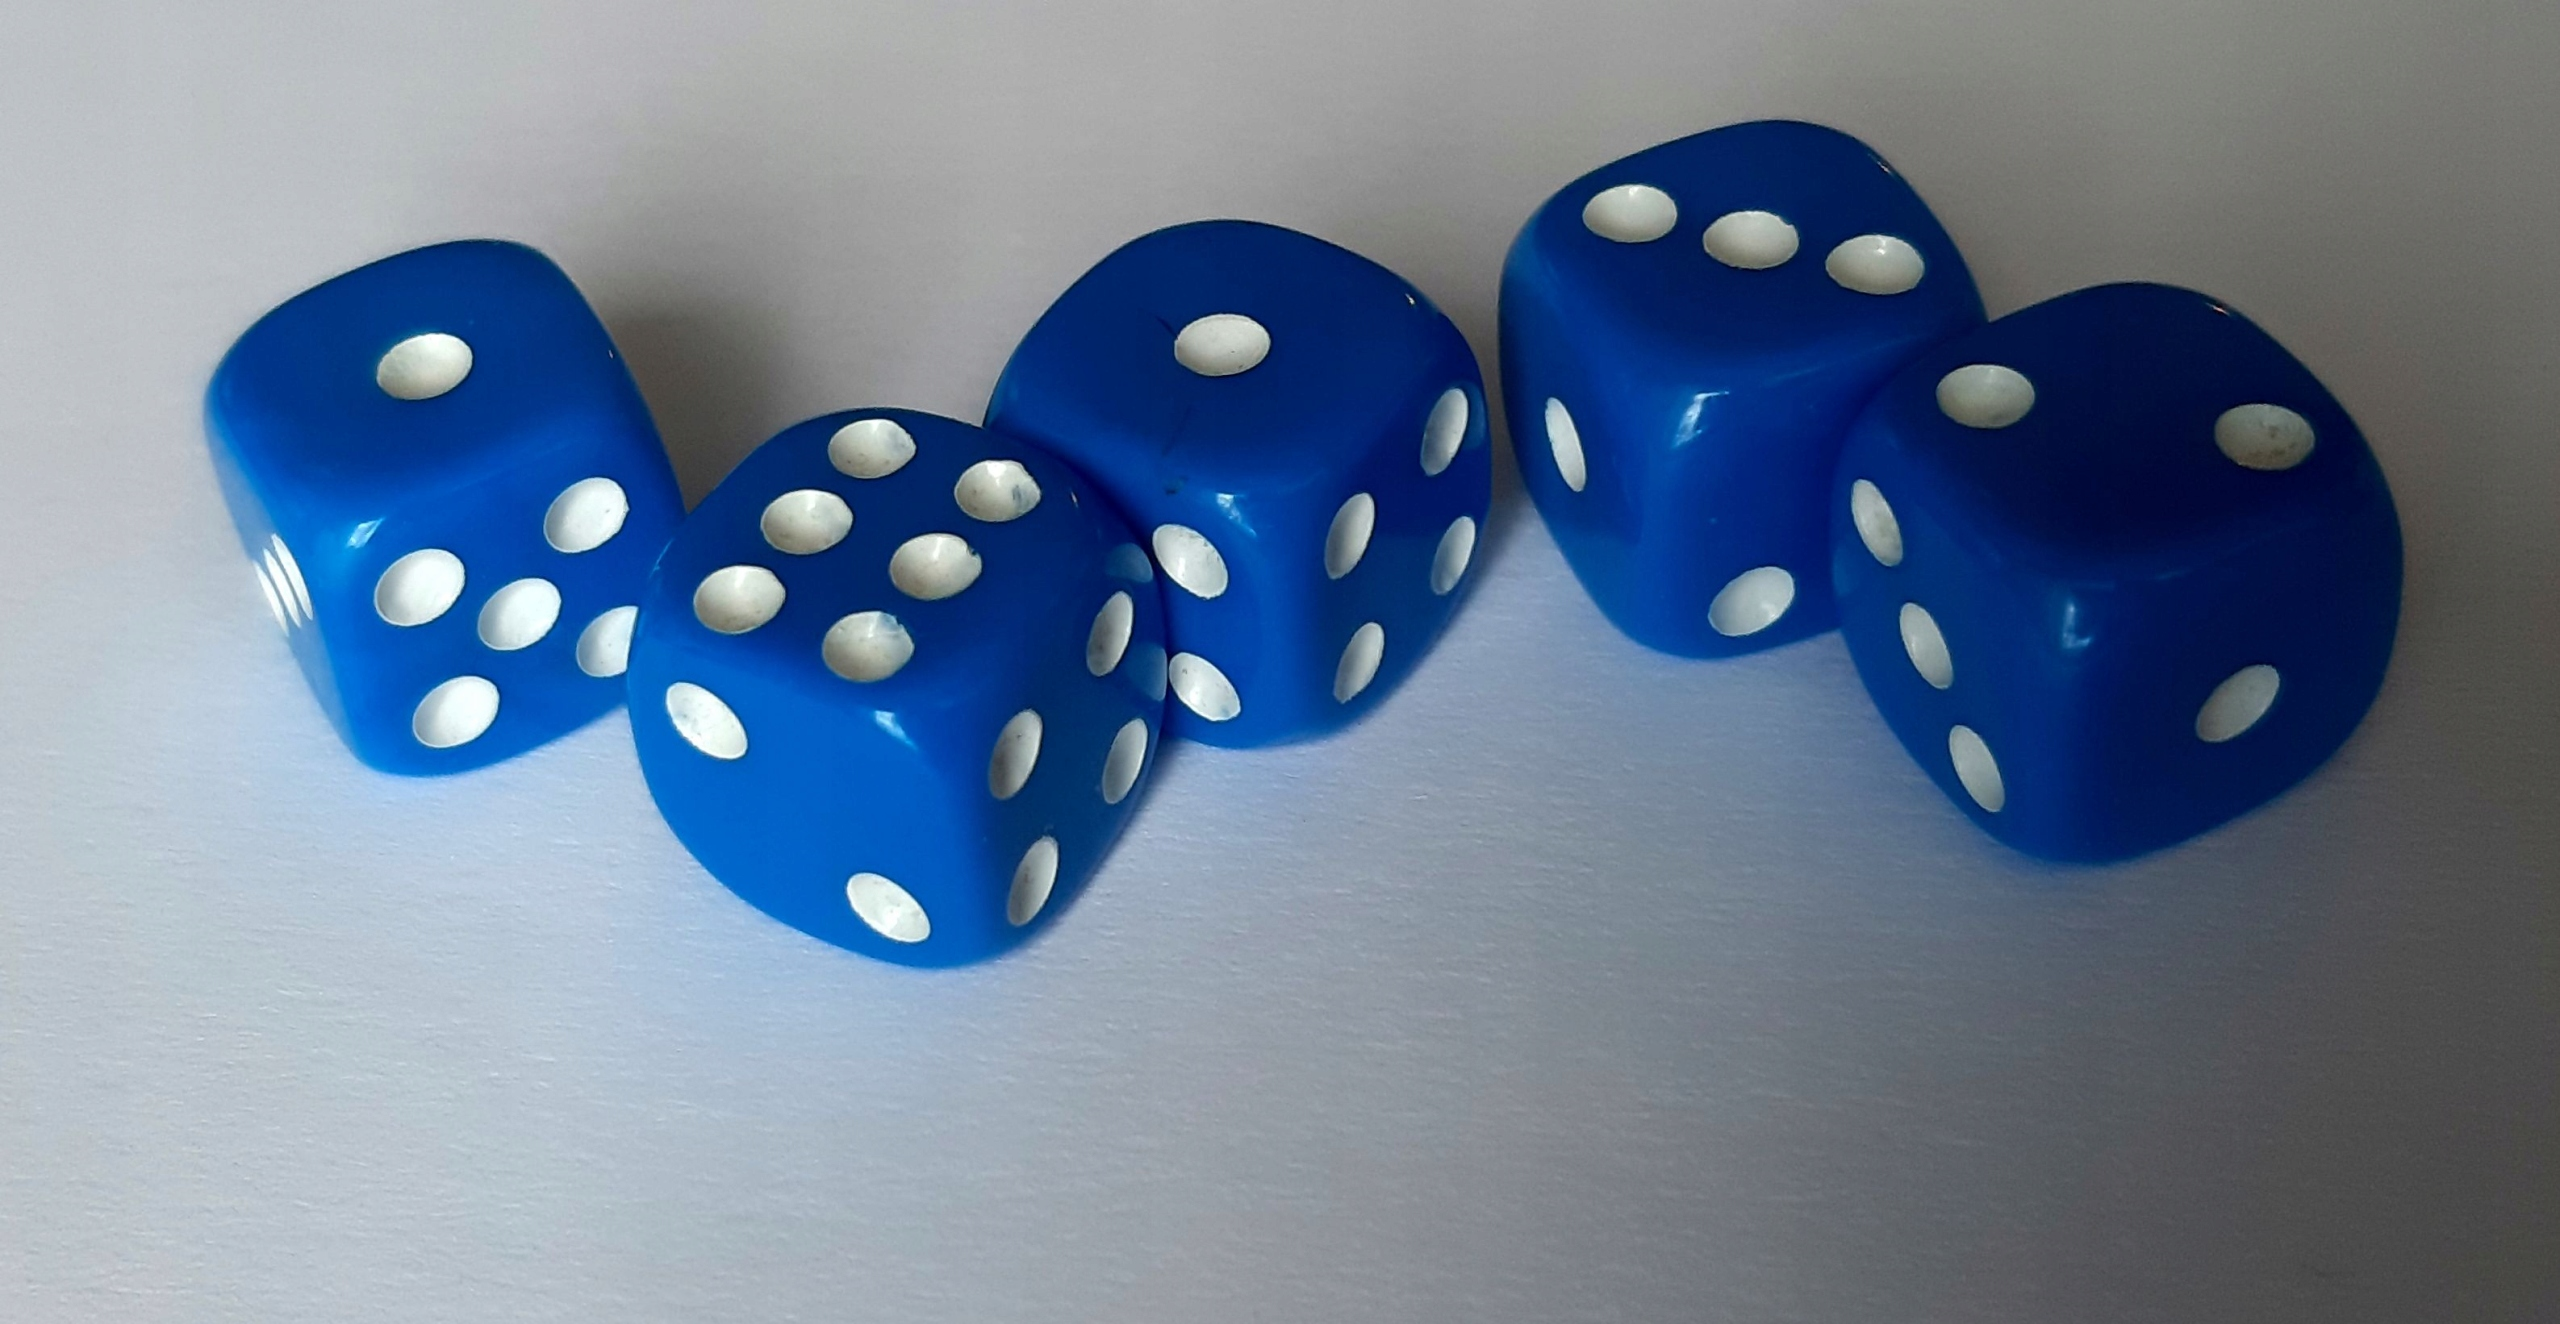 Kocka, kosť, matná K6, modrá, 5 kusov